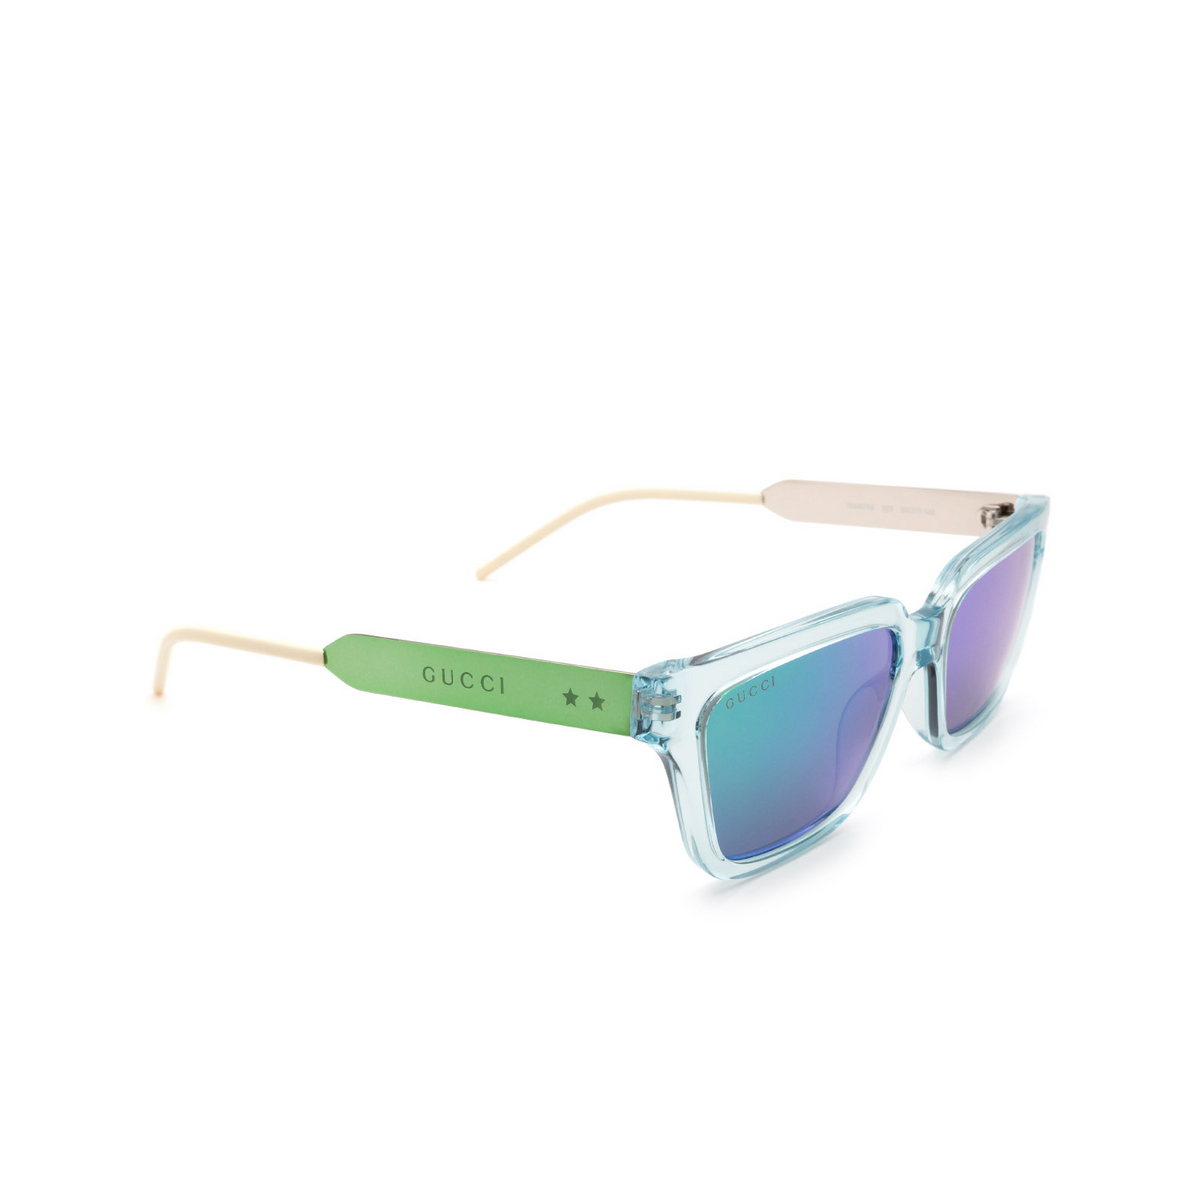 Gucci® Rectangle Sunglasses: GG0975S color Light Blue 003.